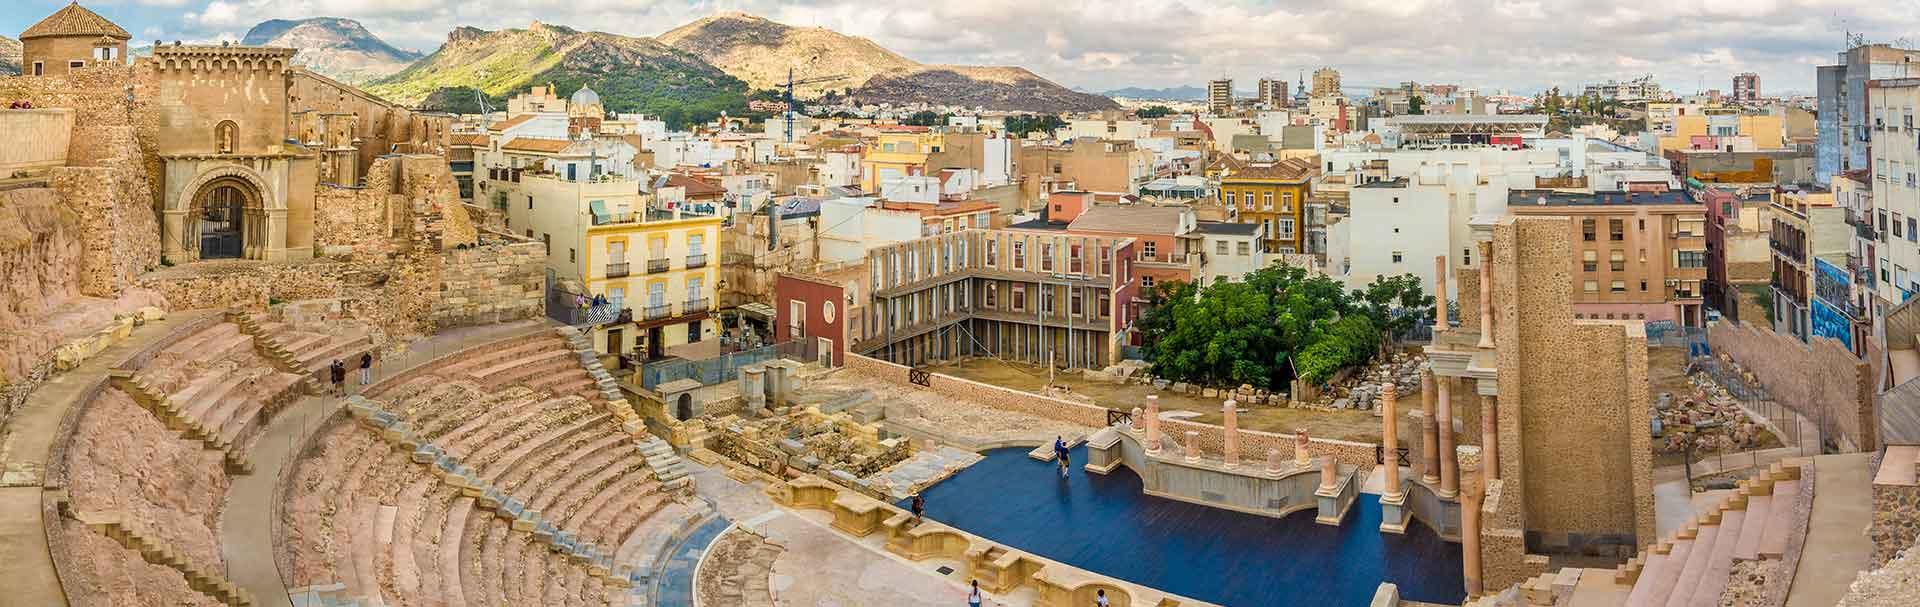 Classic runins in Spain